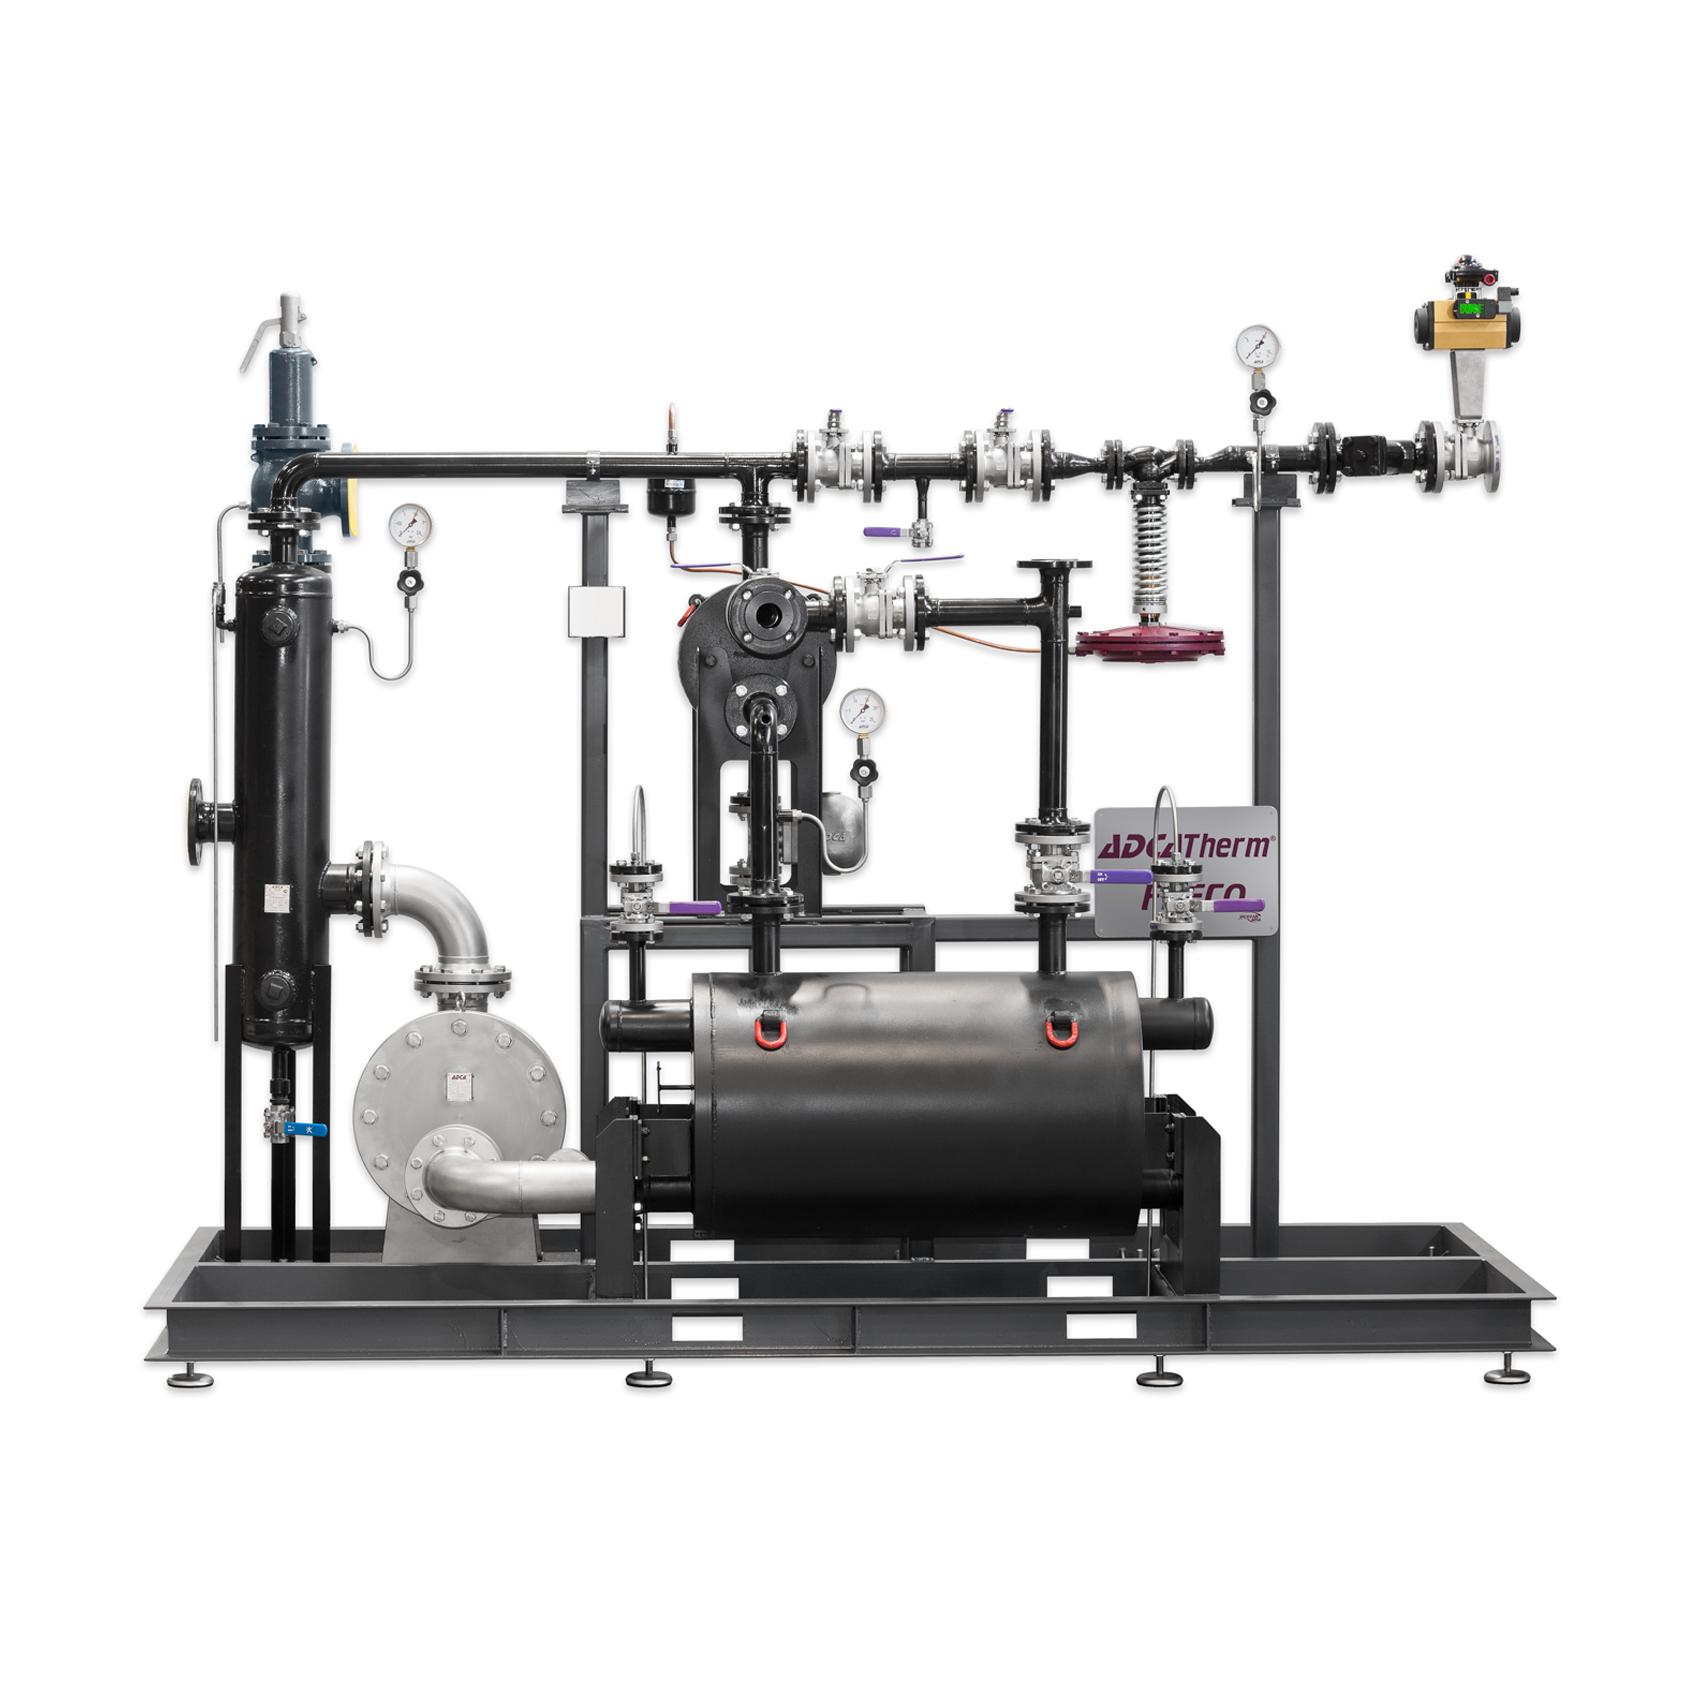 Система рекуперации тепла острого пара или высокотемпературного конденсатаFRECO  ADCA Прима Трейдинг Prima Trading